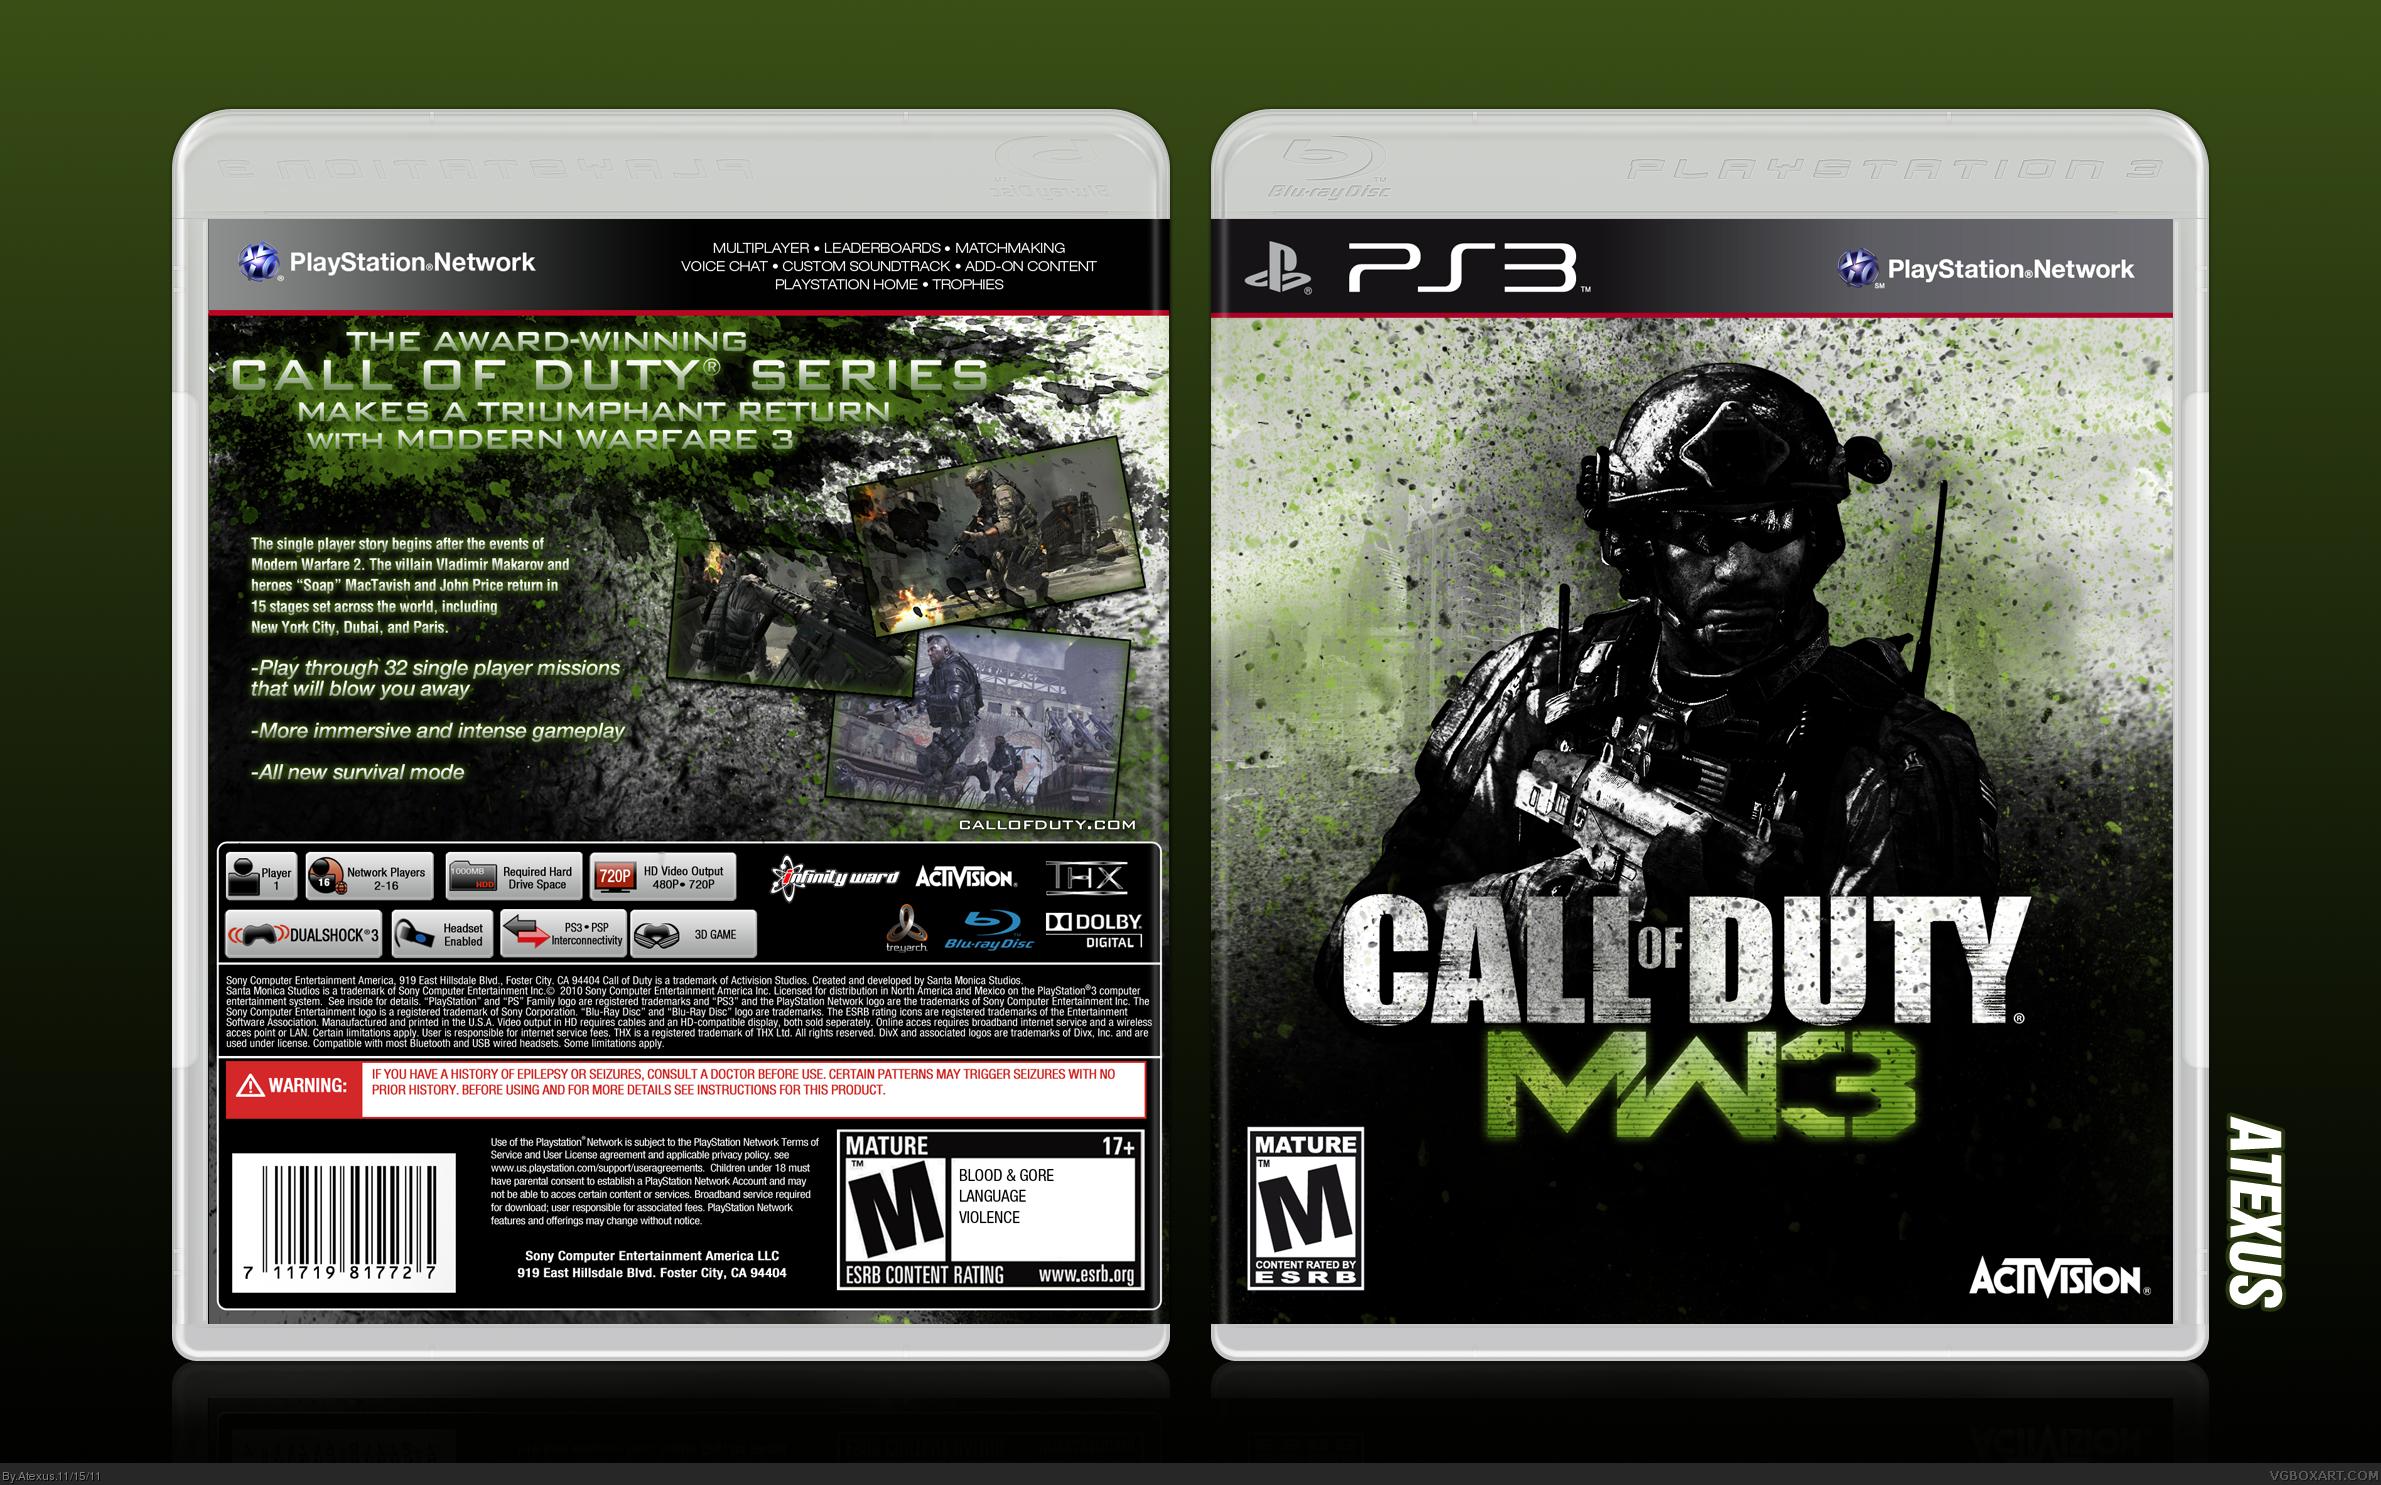 Call Of Duty Modern Warfare 3 Playstation 3 Box Art Cover By Atexus